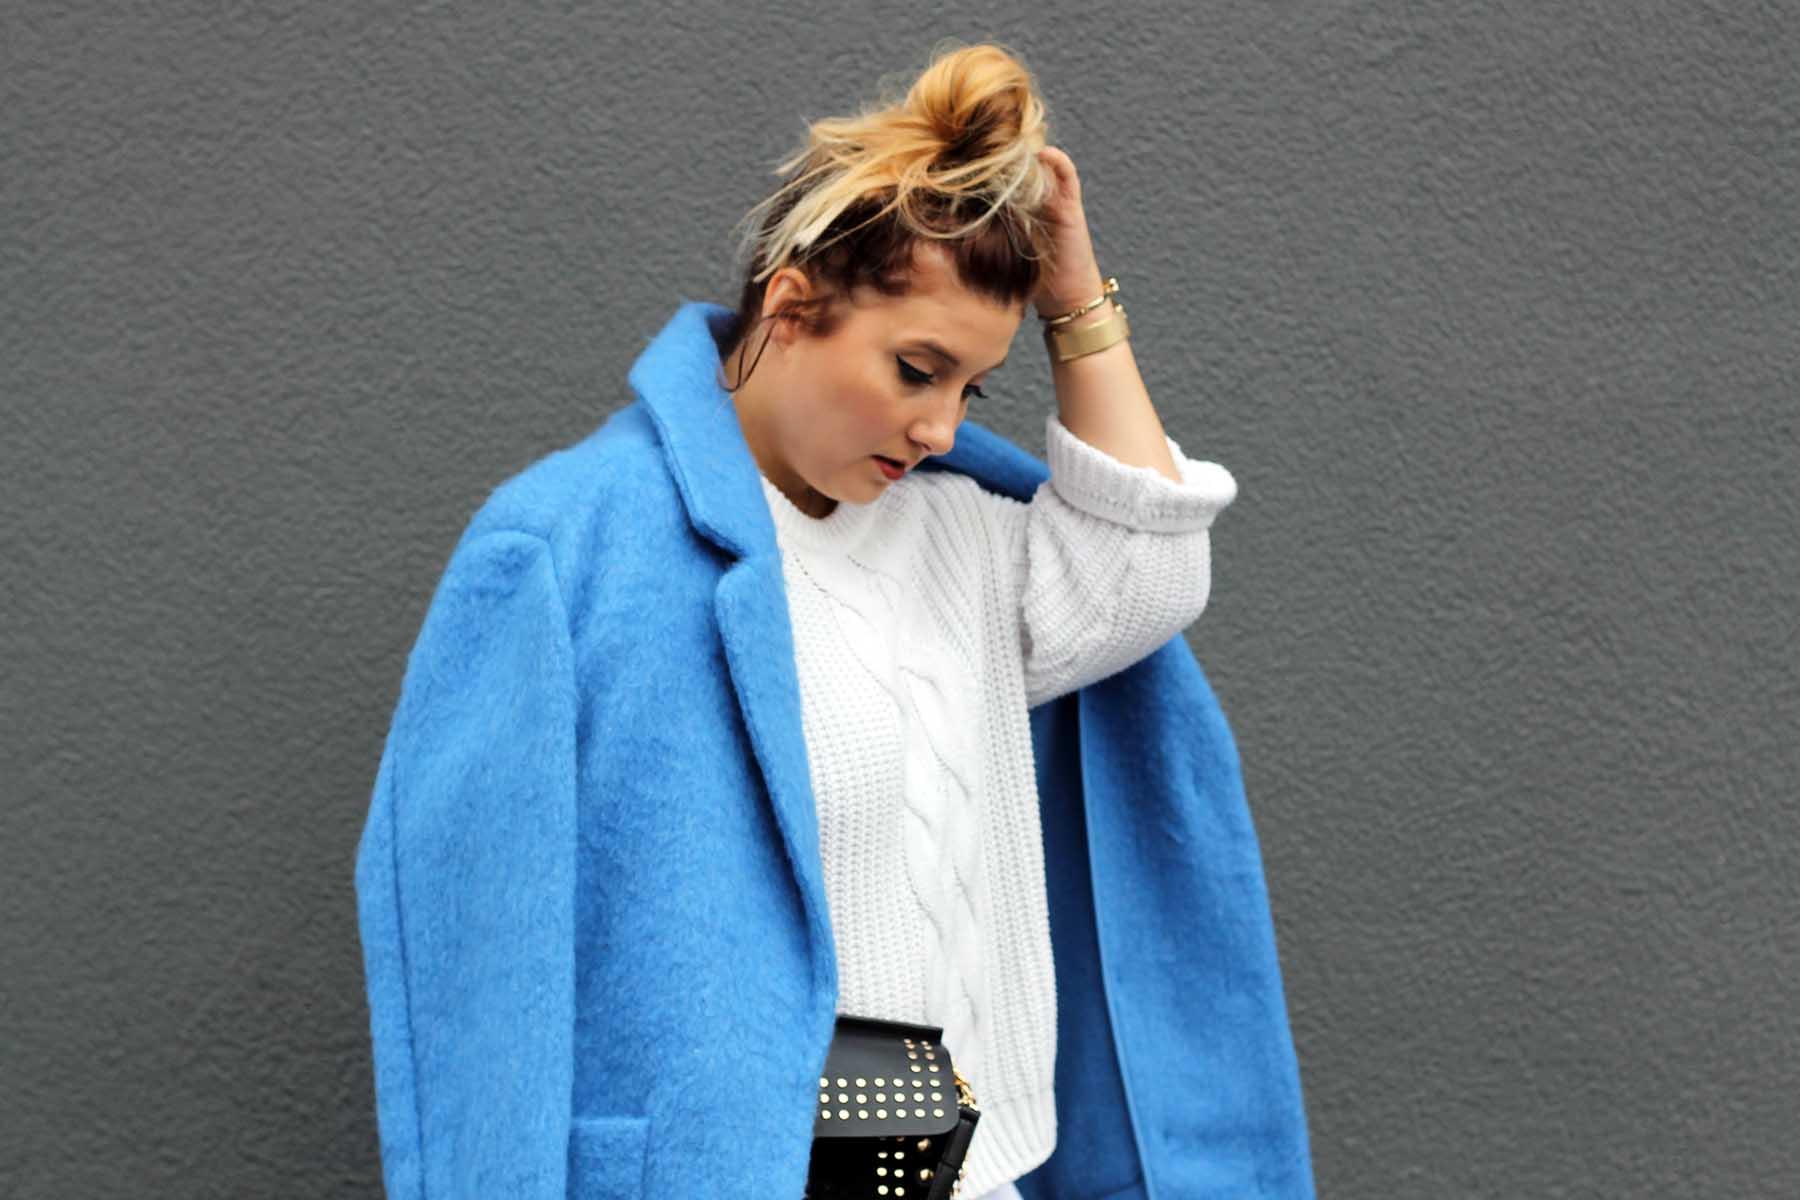 outfit-look-style-modeblog-fashionblog-blauer-mantel-jeans-balenciaga-lookalike-boots-chloe24